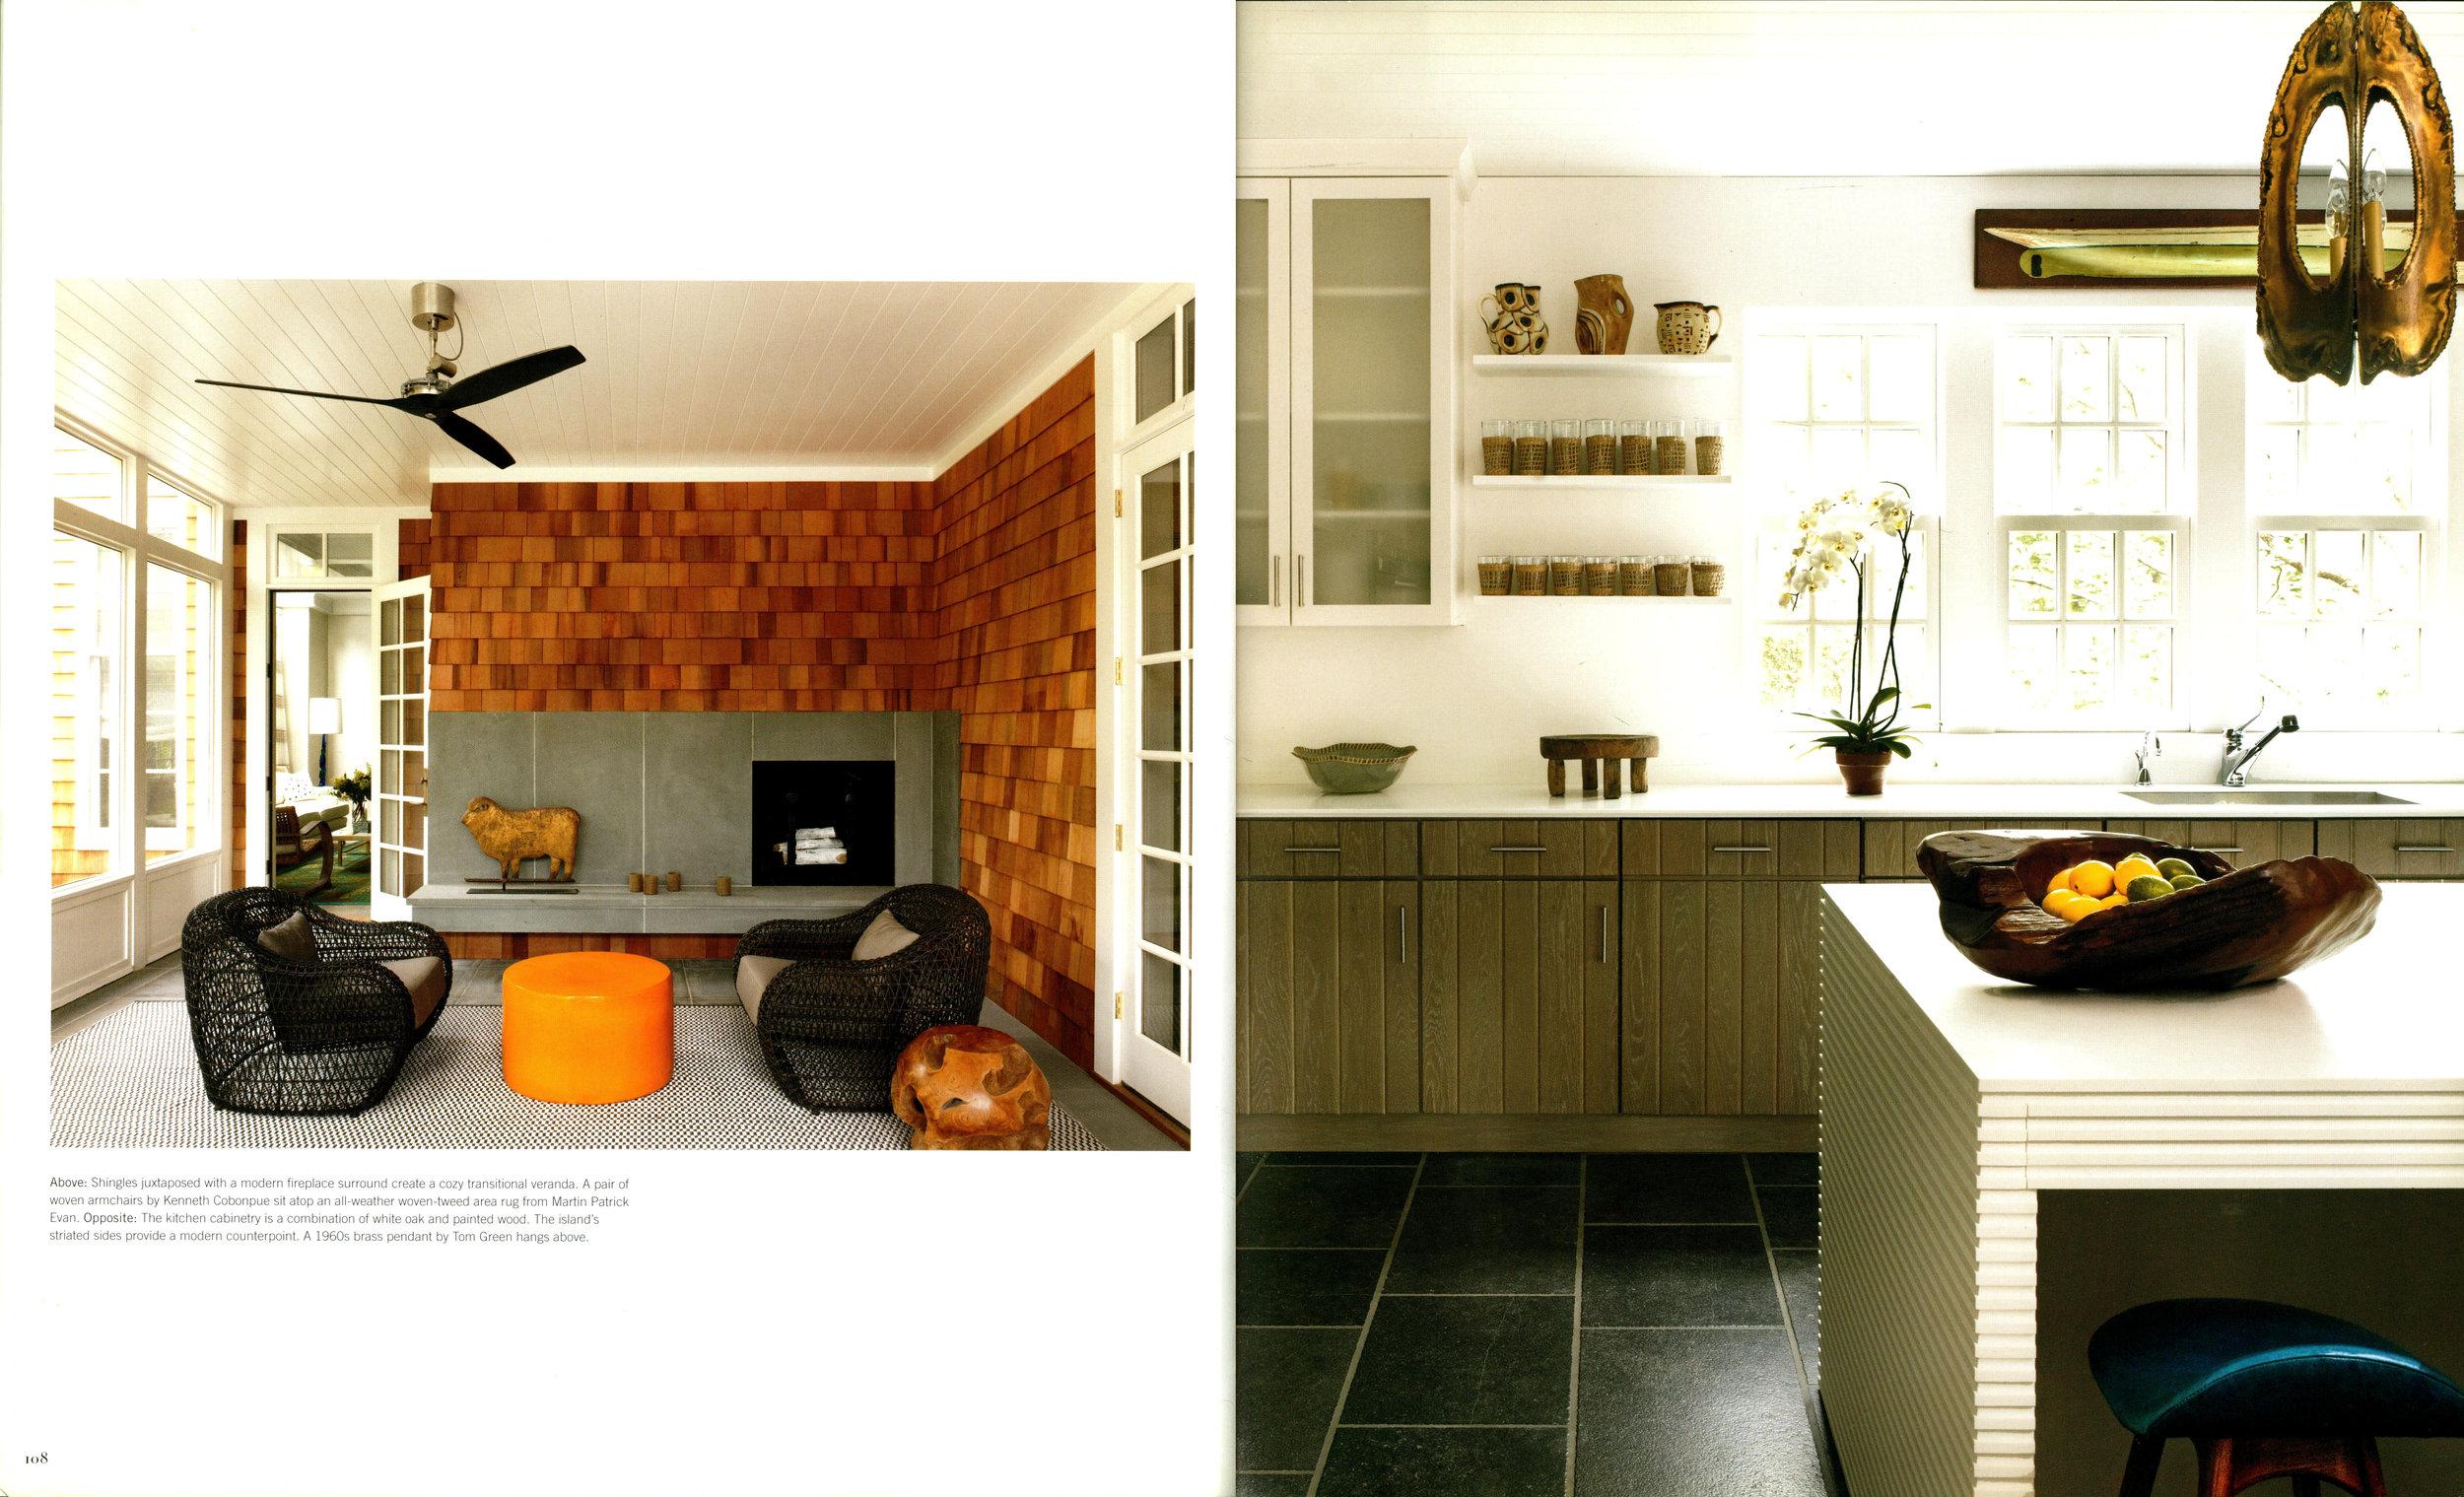 Design in the hamptons spread 8.jpg